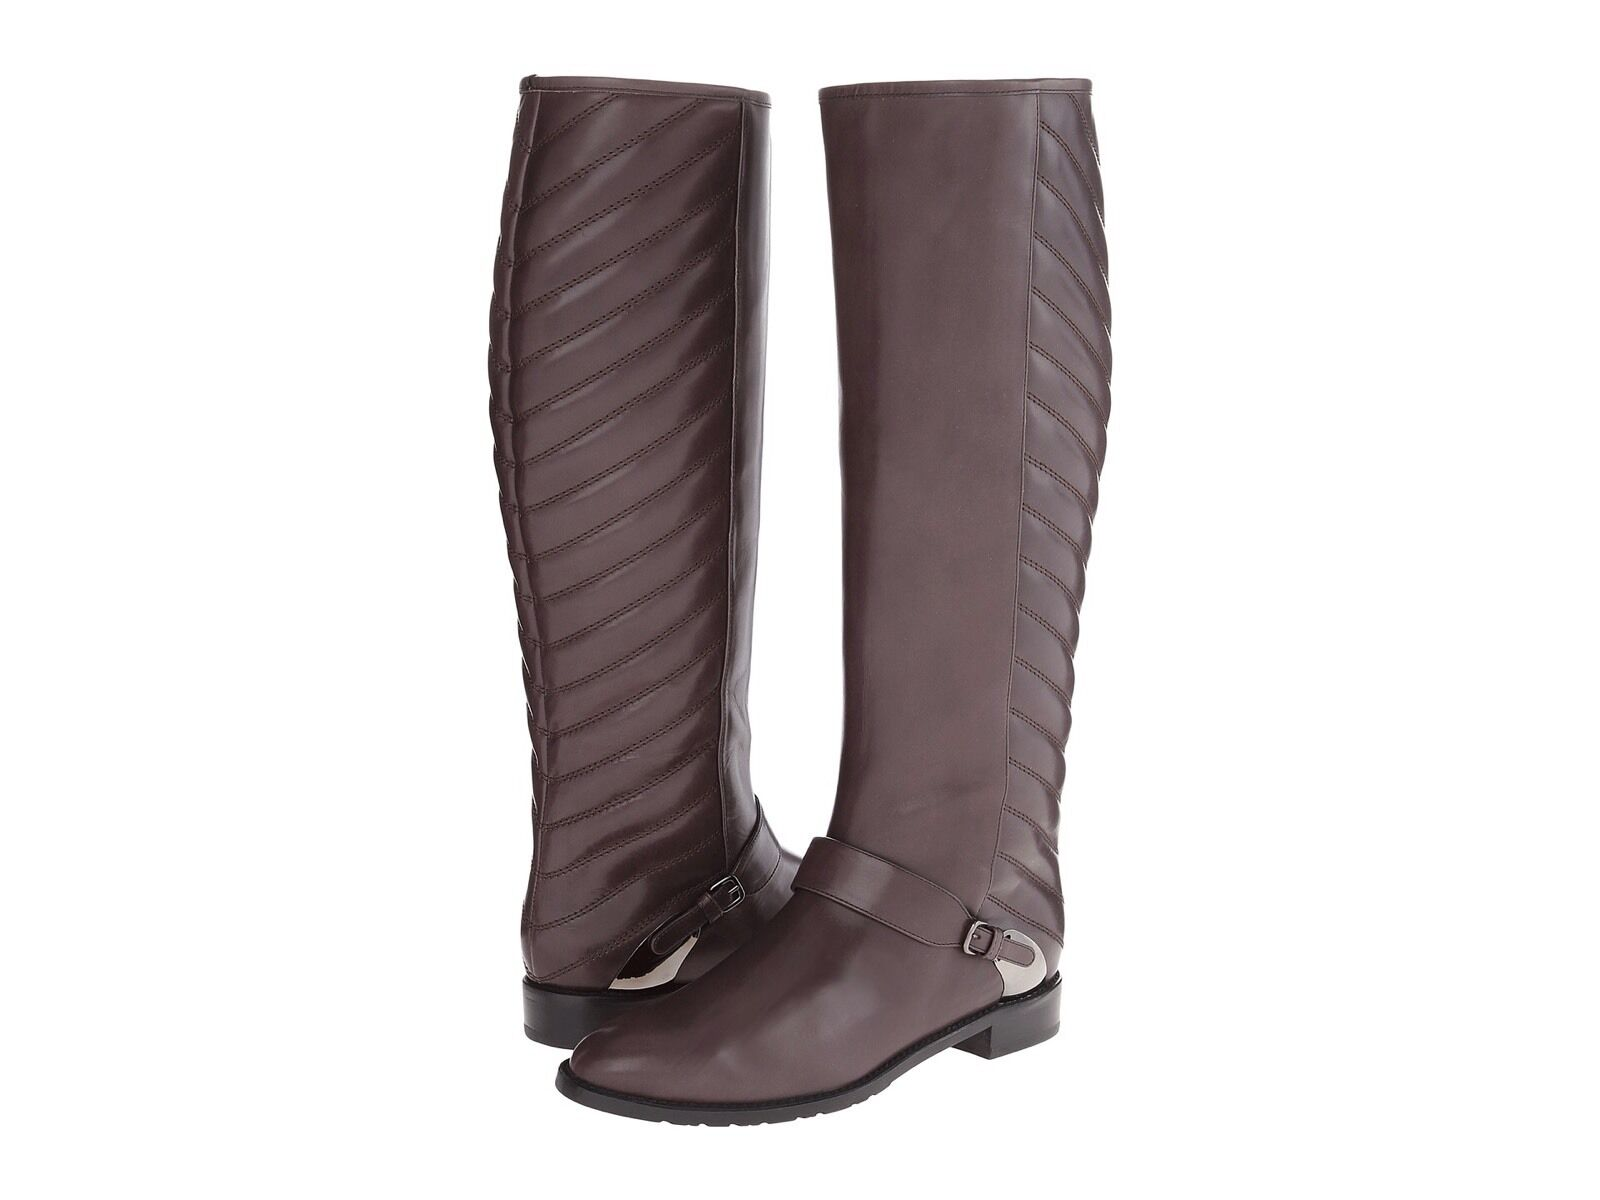 695.00 NEW Stuart Weitzman Raceway Brown Leather Boots shoes 12 12M 12B 42